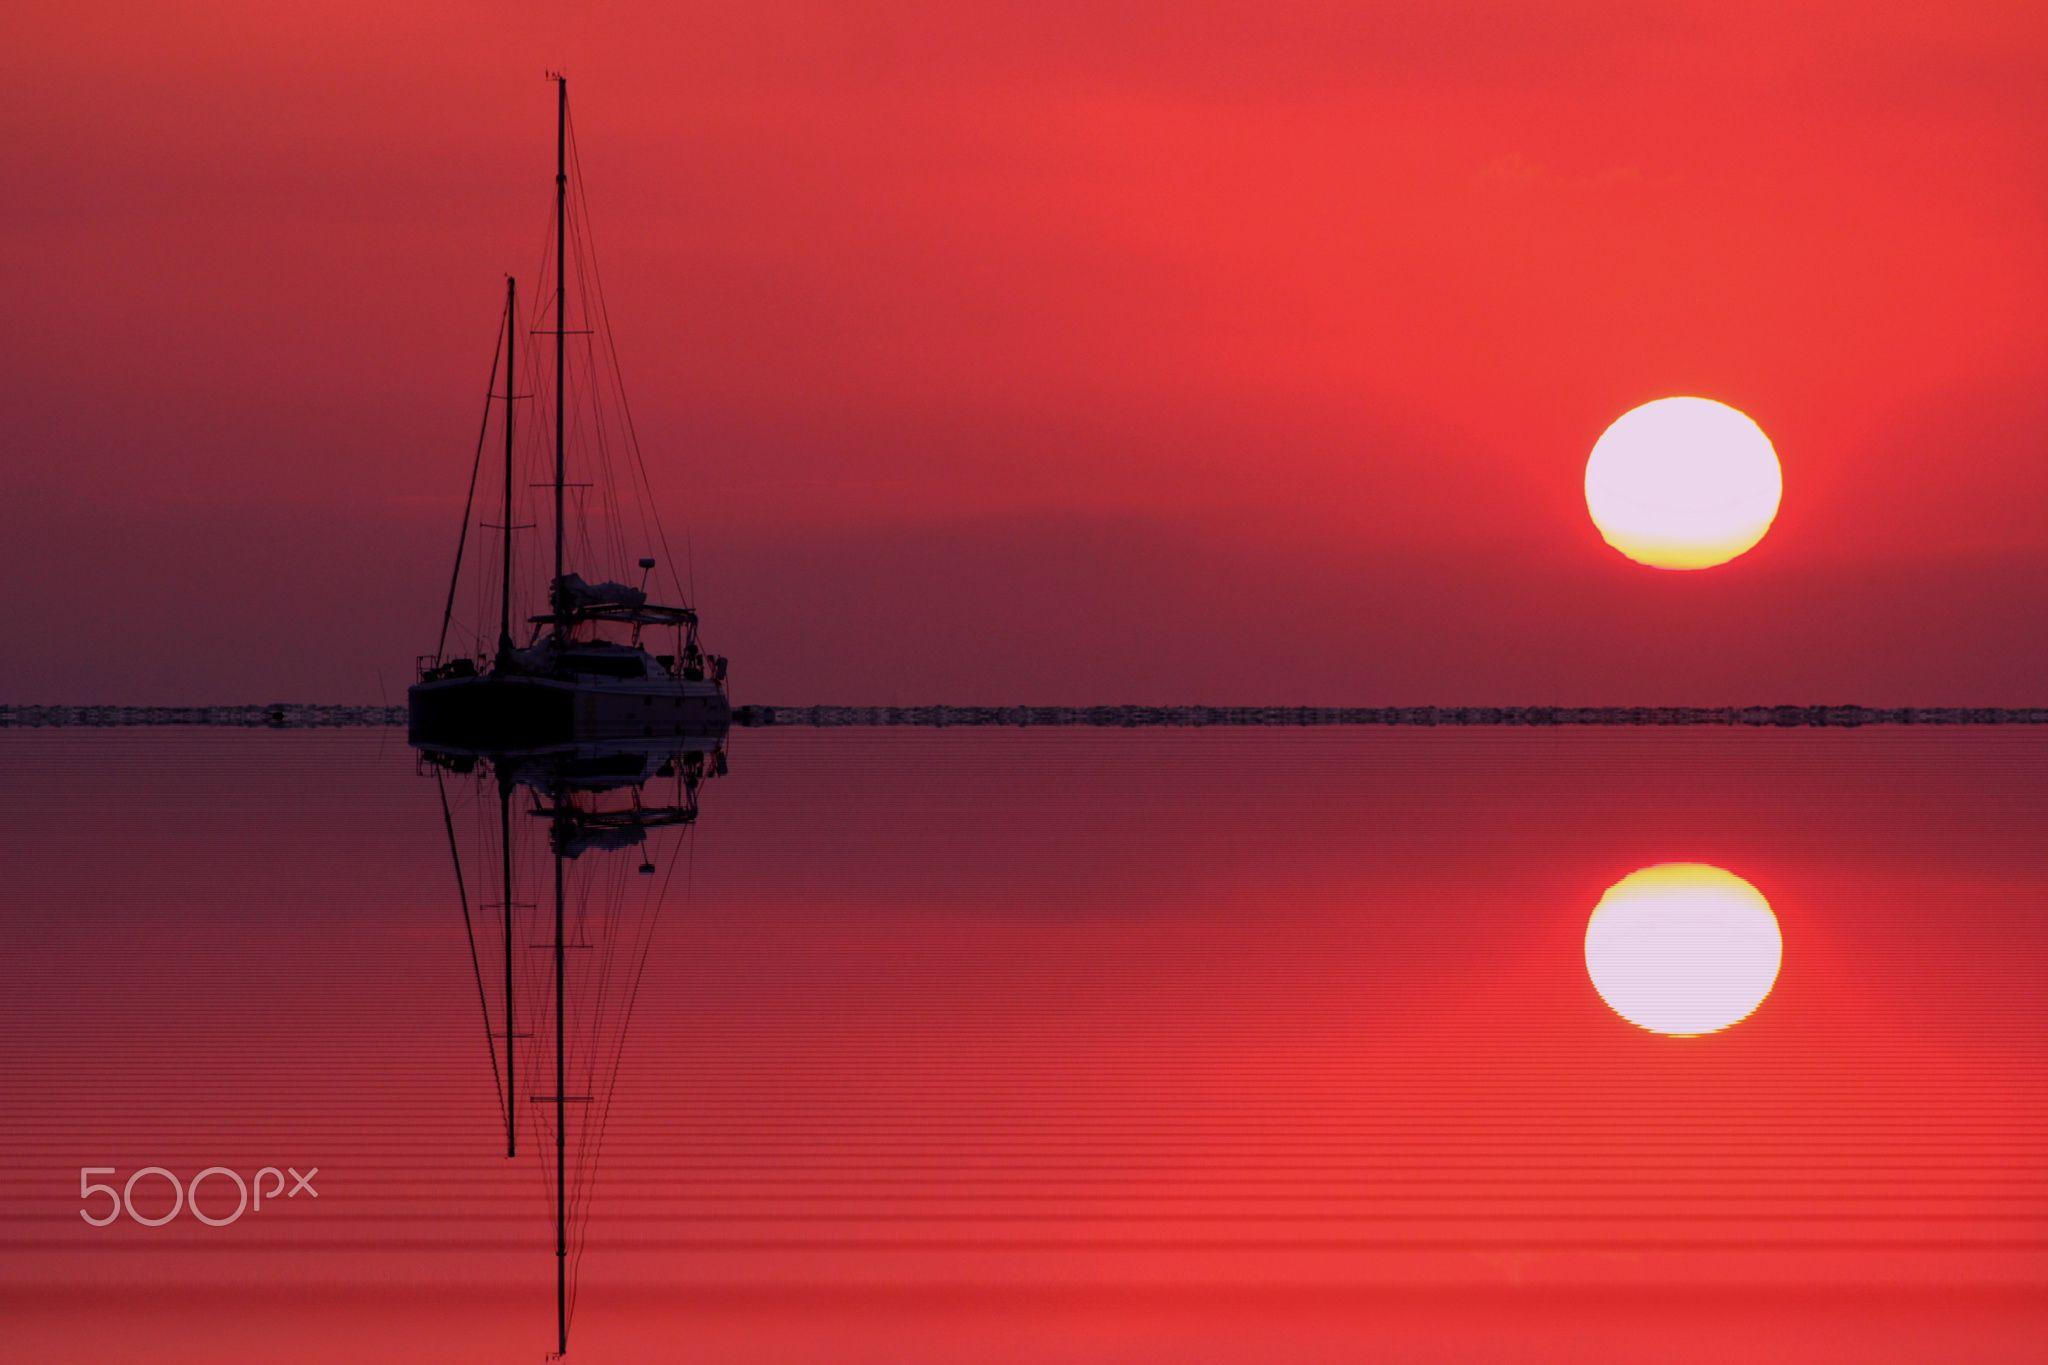 Caye Caulker - Foto do por do sol em Belise.